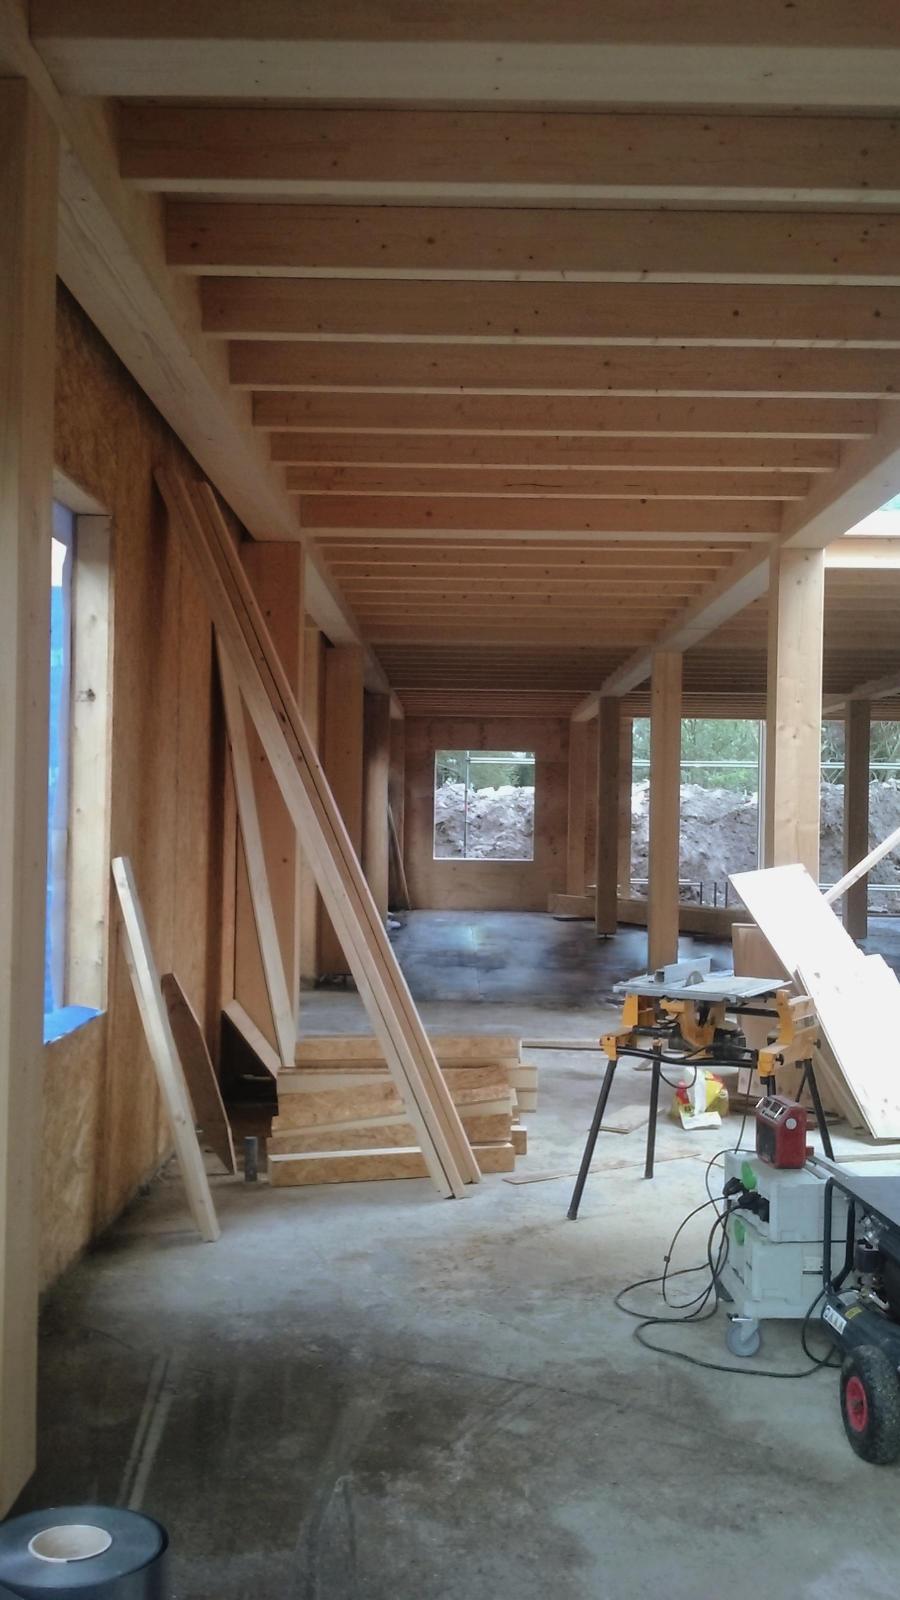 drzm-bij-hen-onlywood-casco-onlywood-balken-plafond.jpg